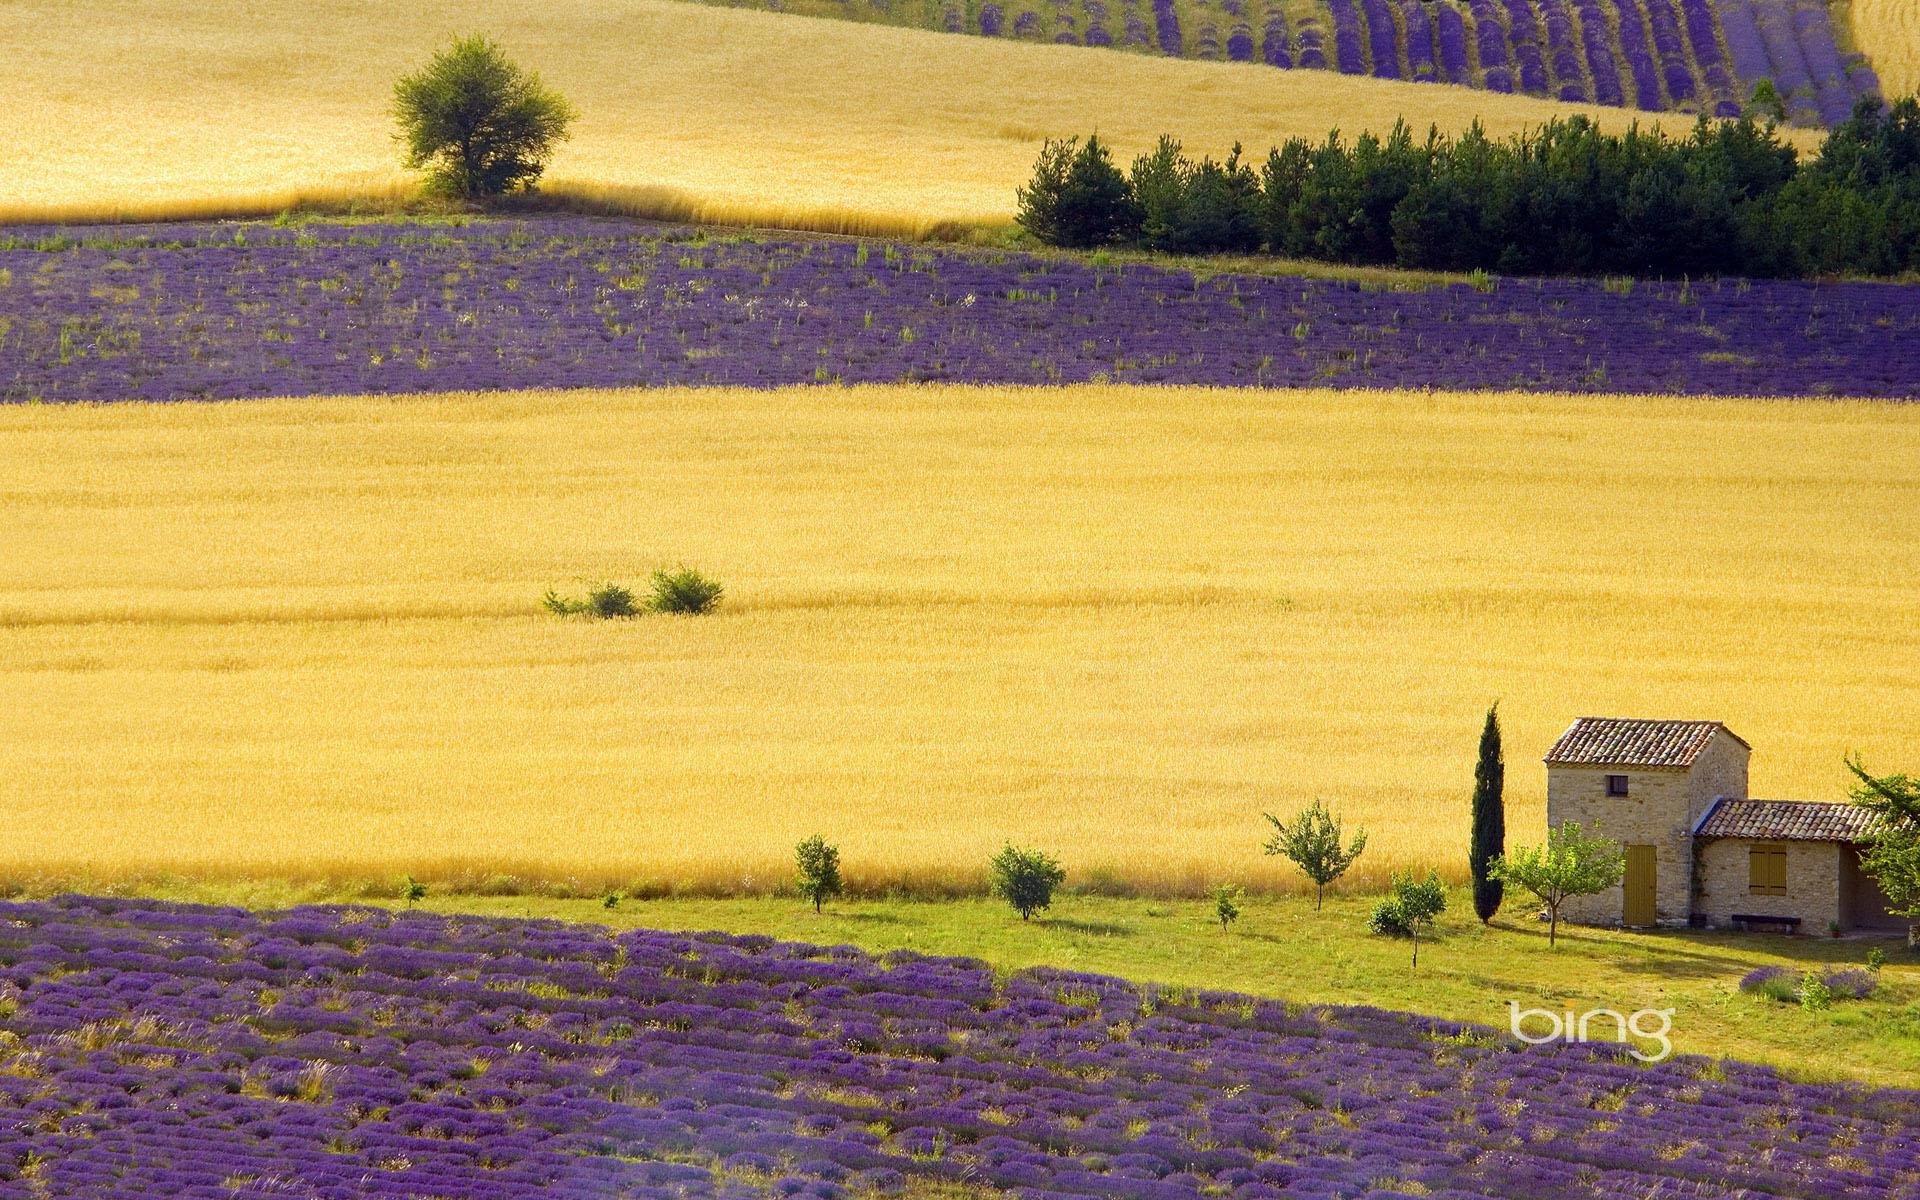 Bing background wallpaper Wallpapers   HD Wallpapers 84233 1920x1200